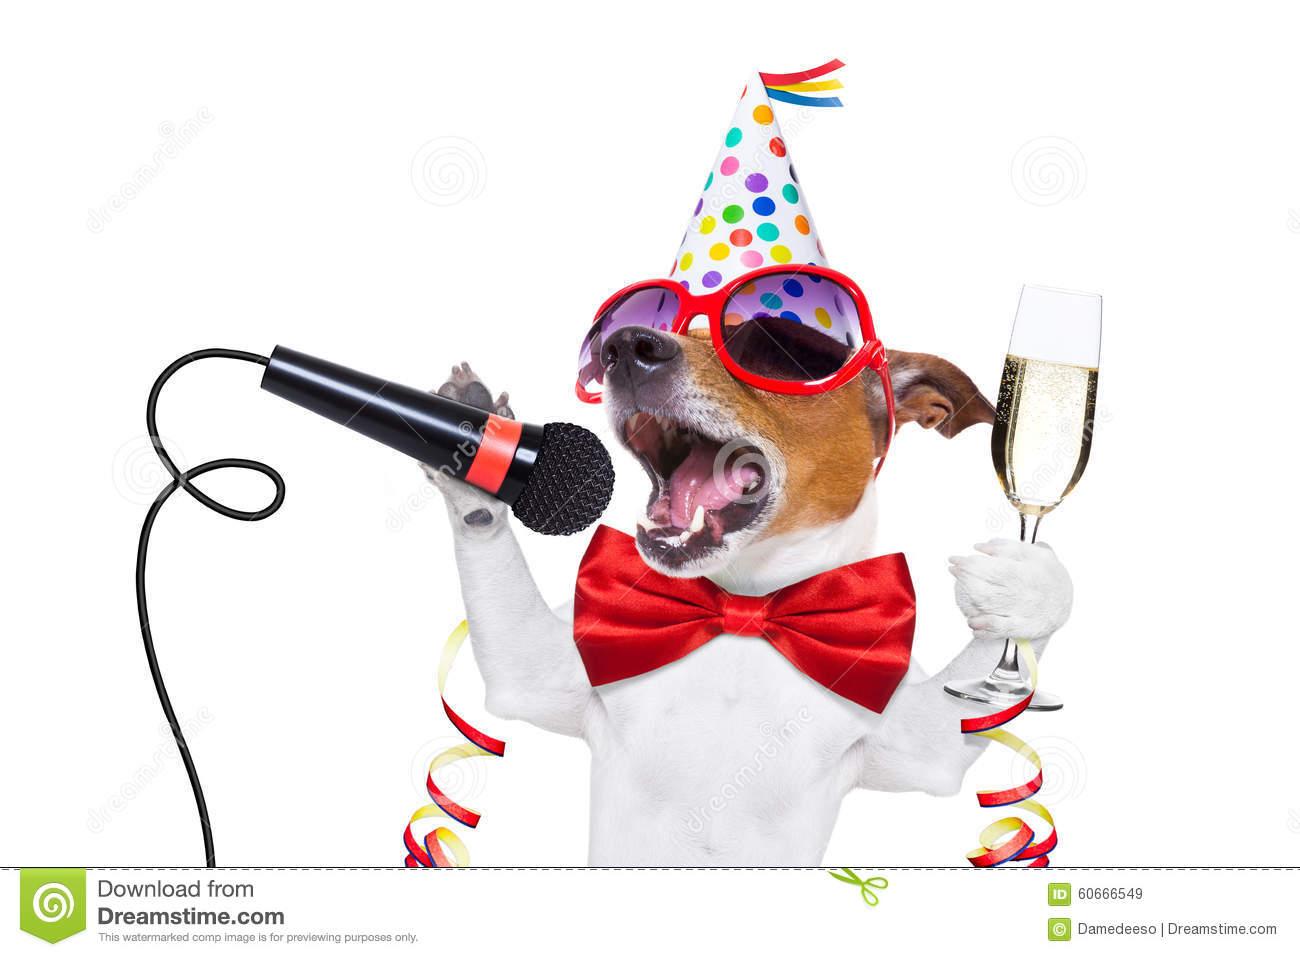 Happy new year dog stock image. Image of karaoke, glass.